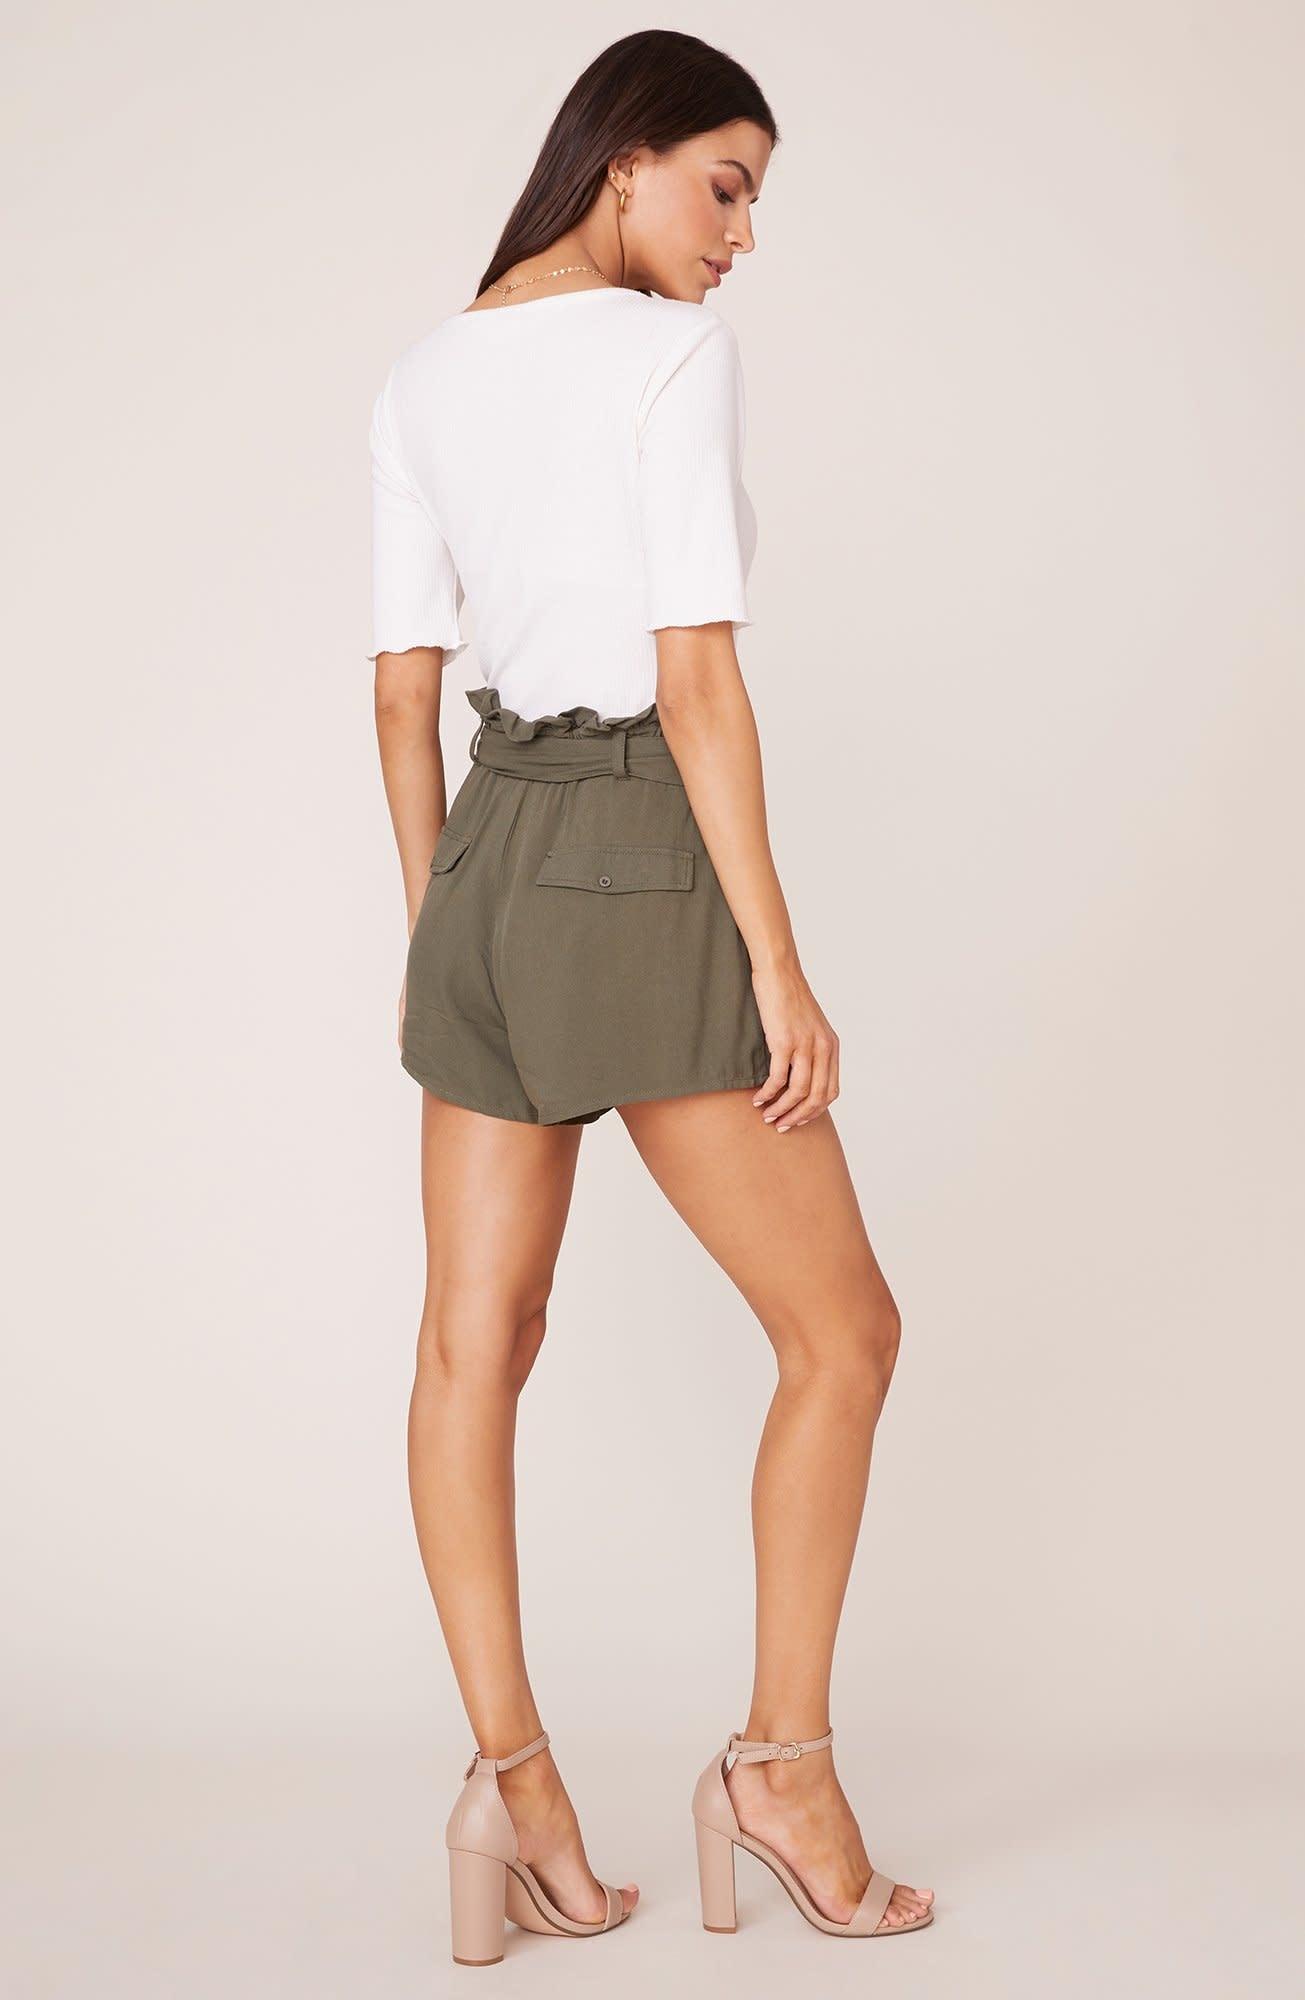 Secure the Bag Sage Shorts